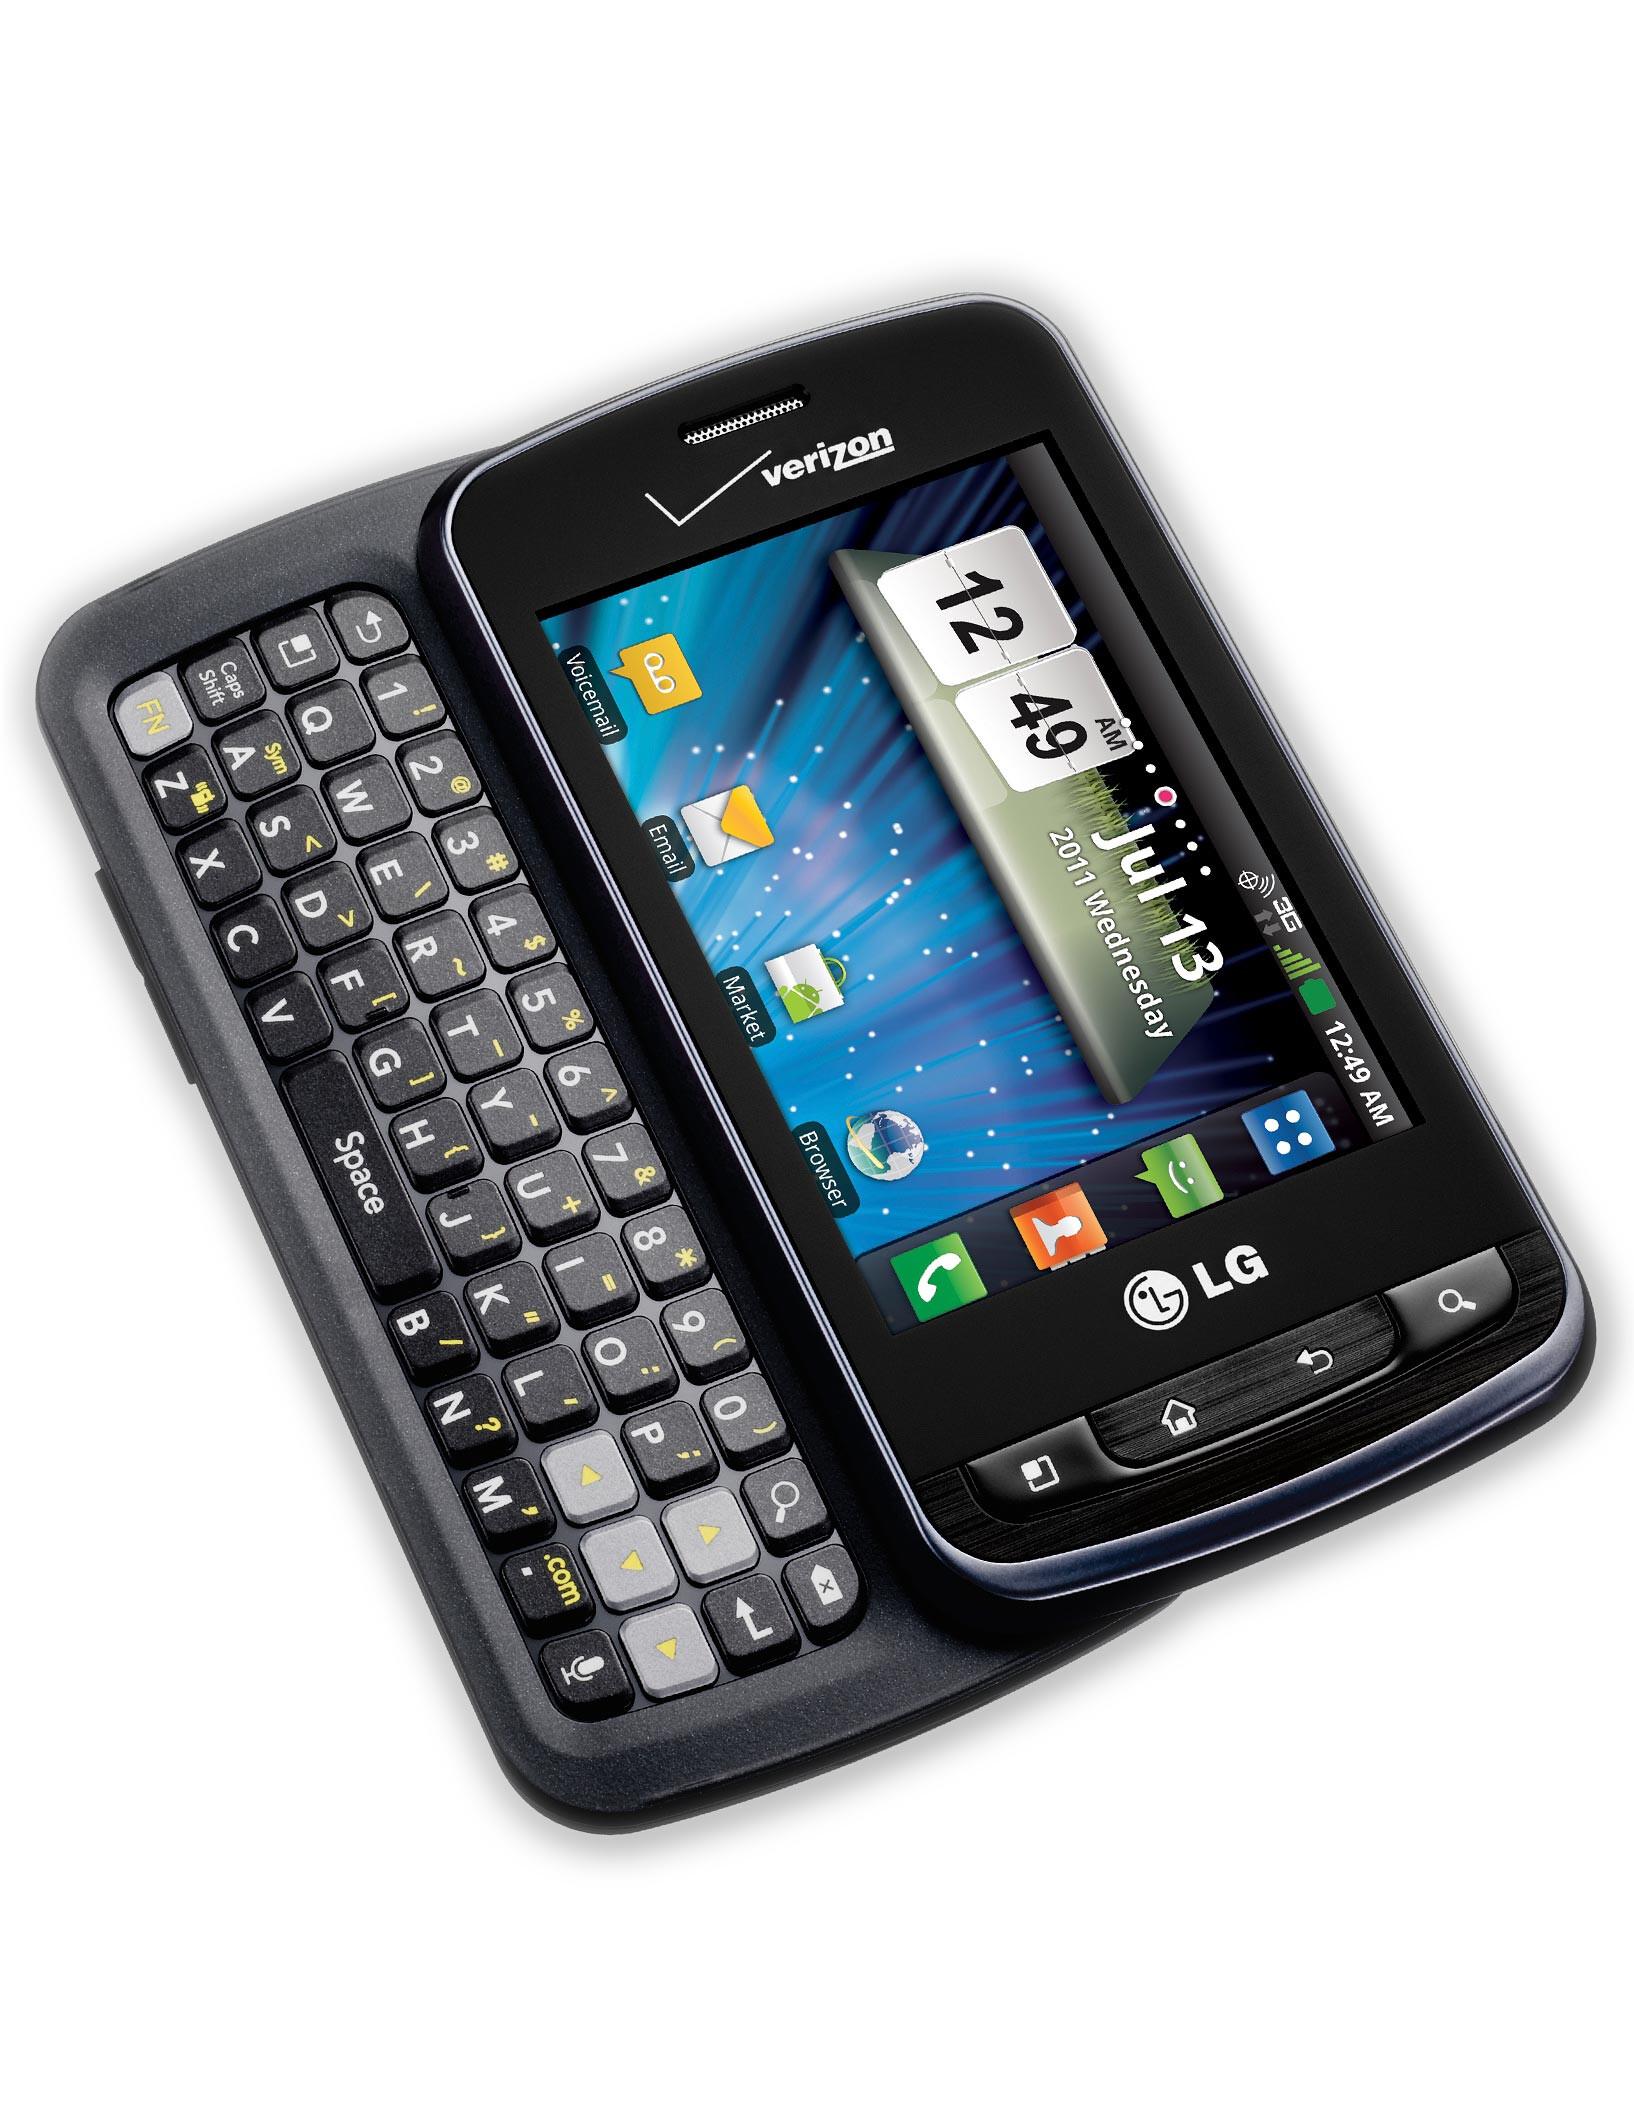 lg enlighten photos rh phonearena com Verizon LG Flip Phones Verizon LG Flip Phones